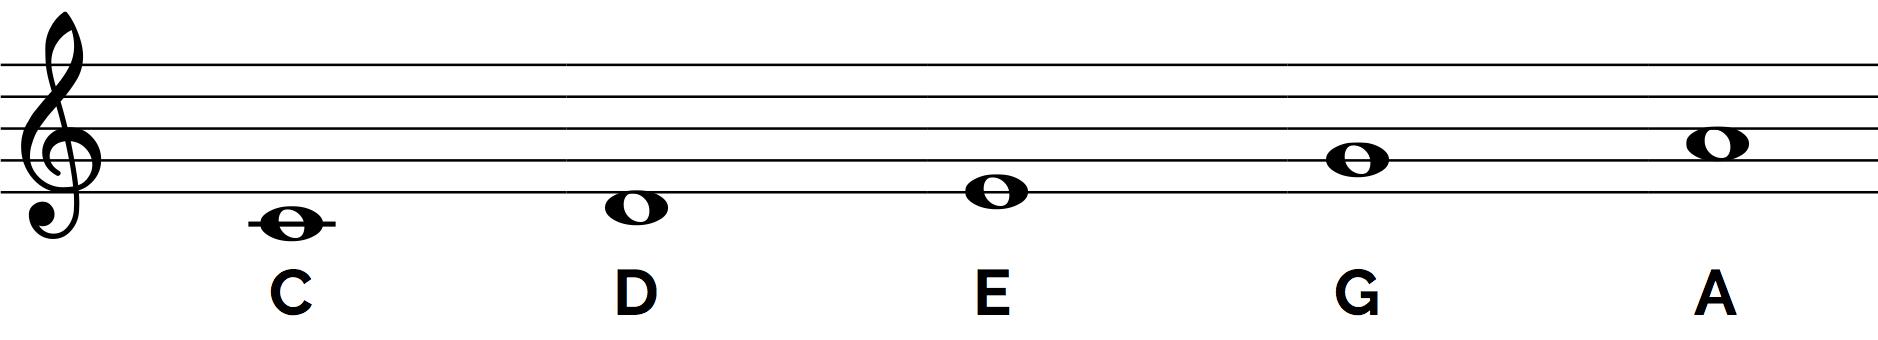 Pentatonic - C Major